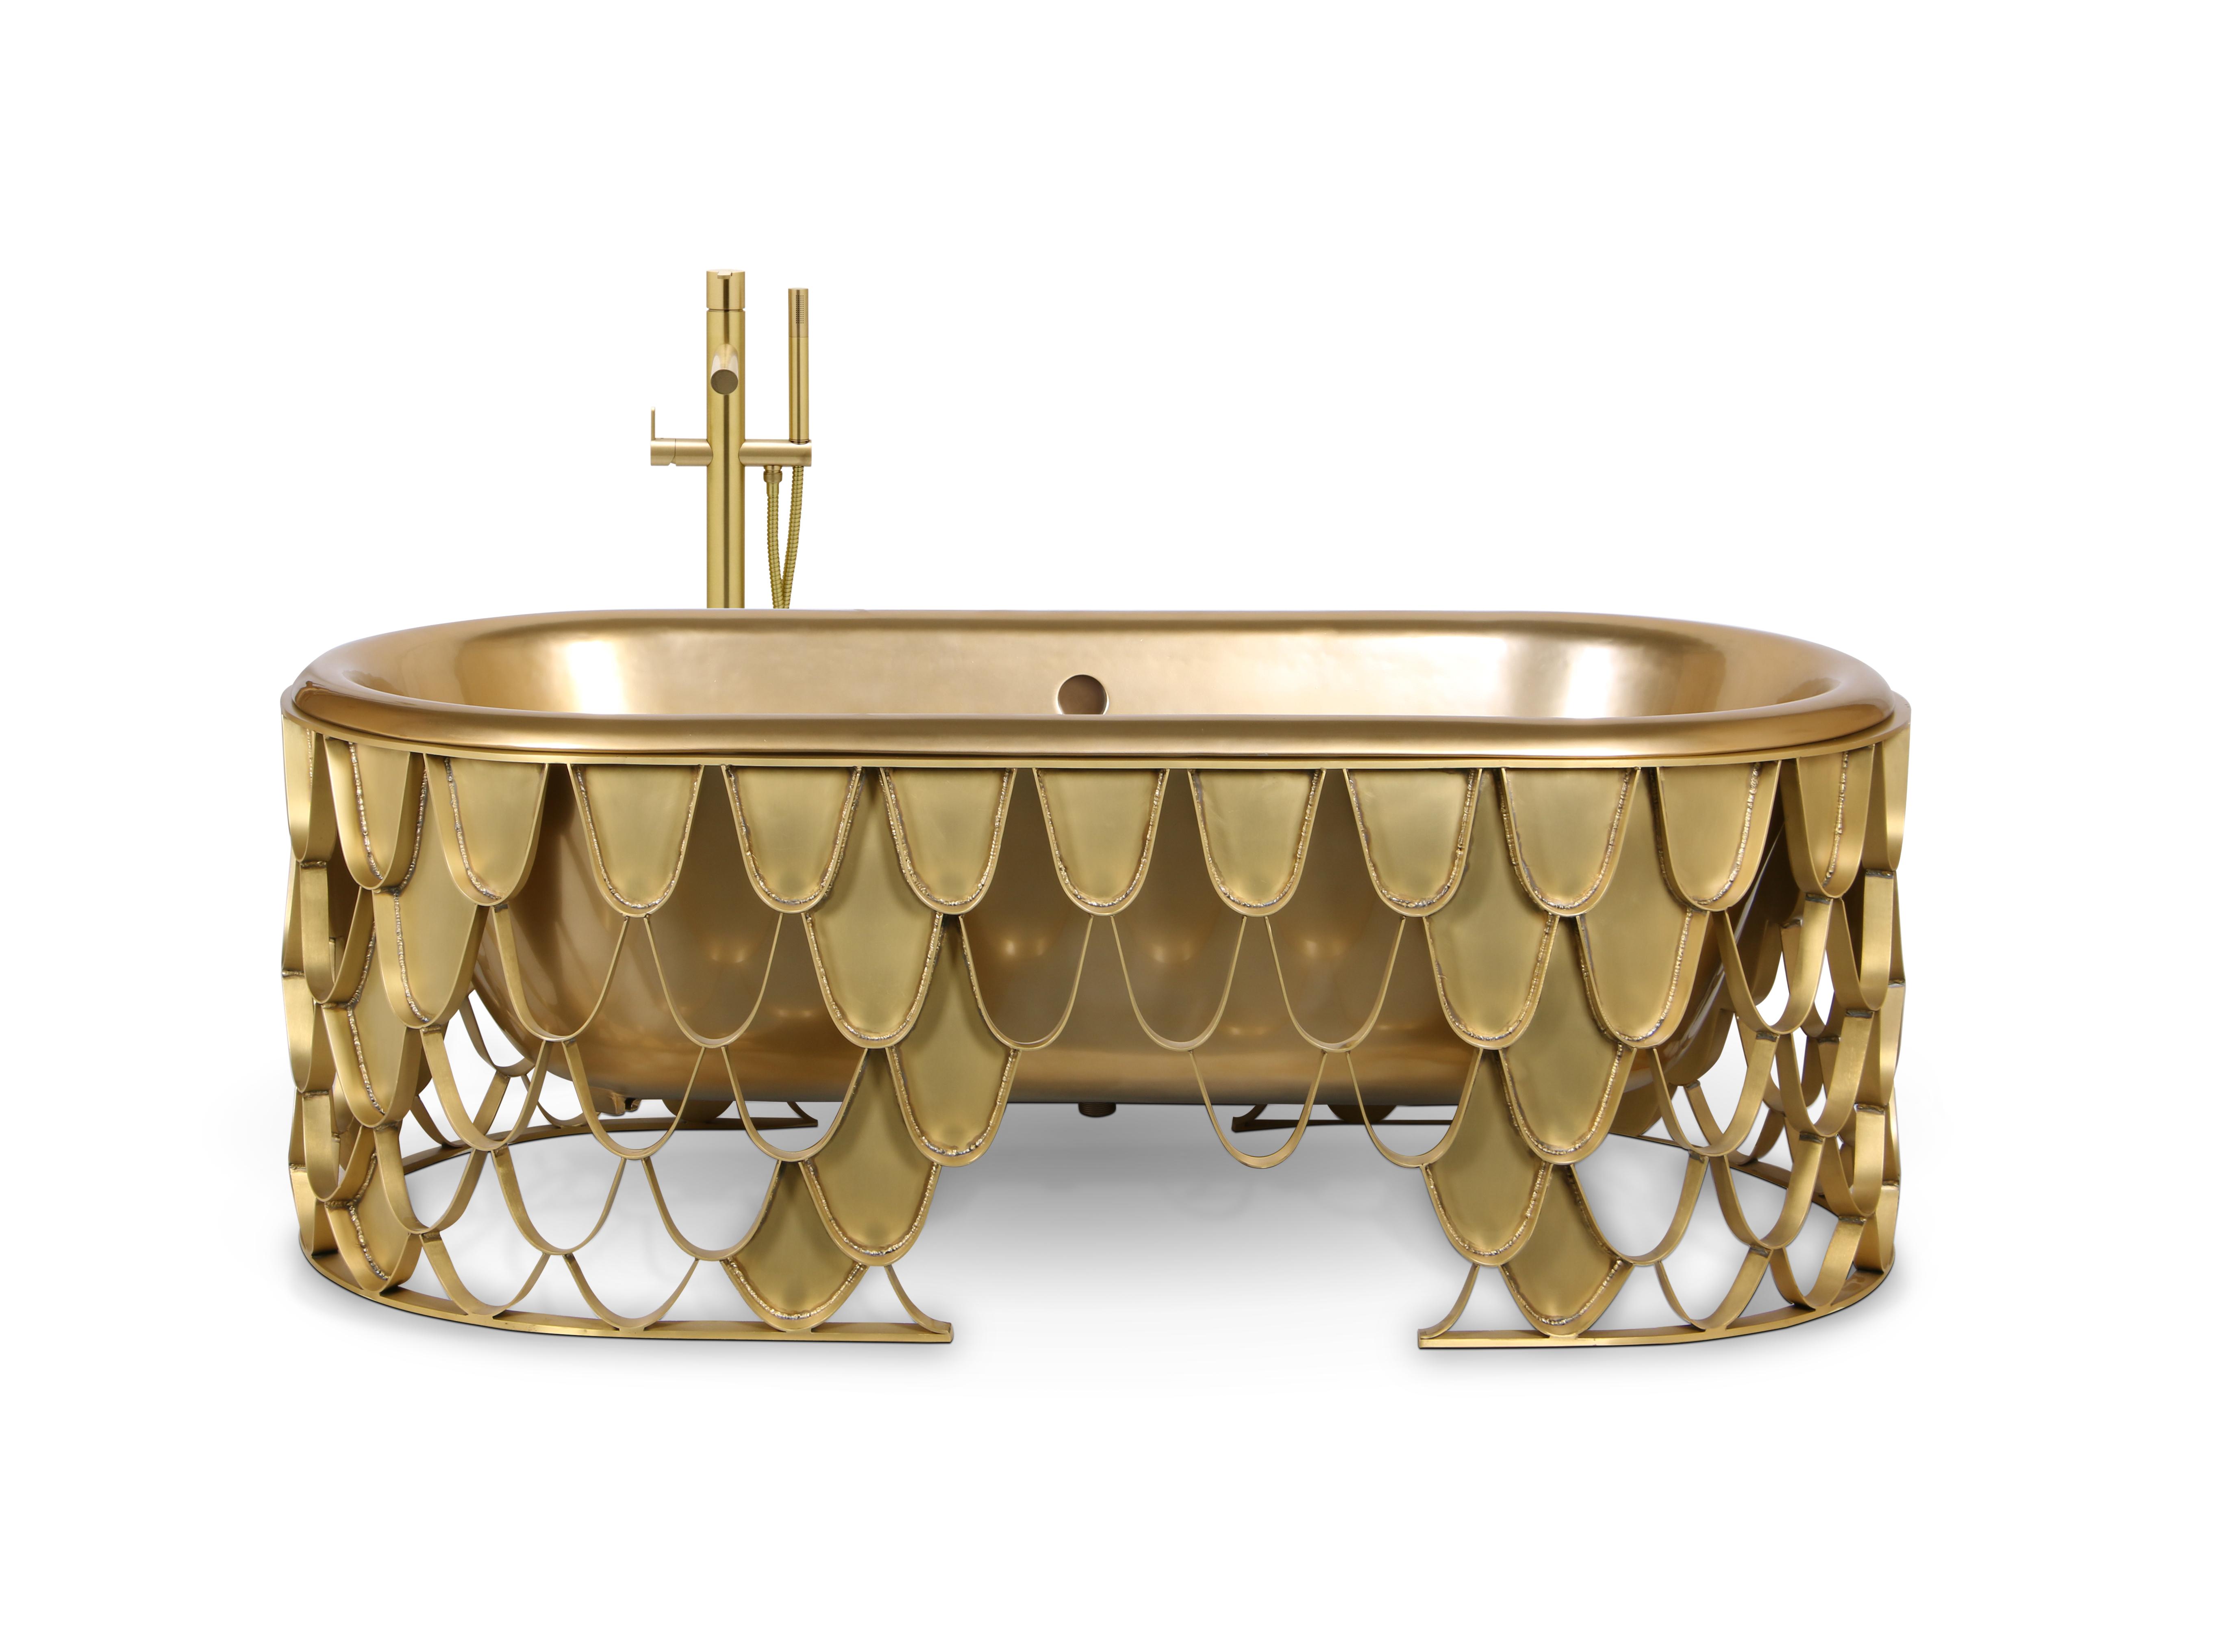 Shake up your bathroom with Maison Valentina´s luxurious bathtubs luxurious bathtubs Shake up your bathroom with Maison Valentina´s luxurious bathtubs koi bathtub